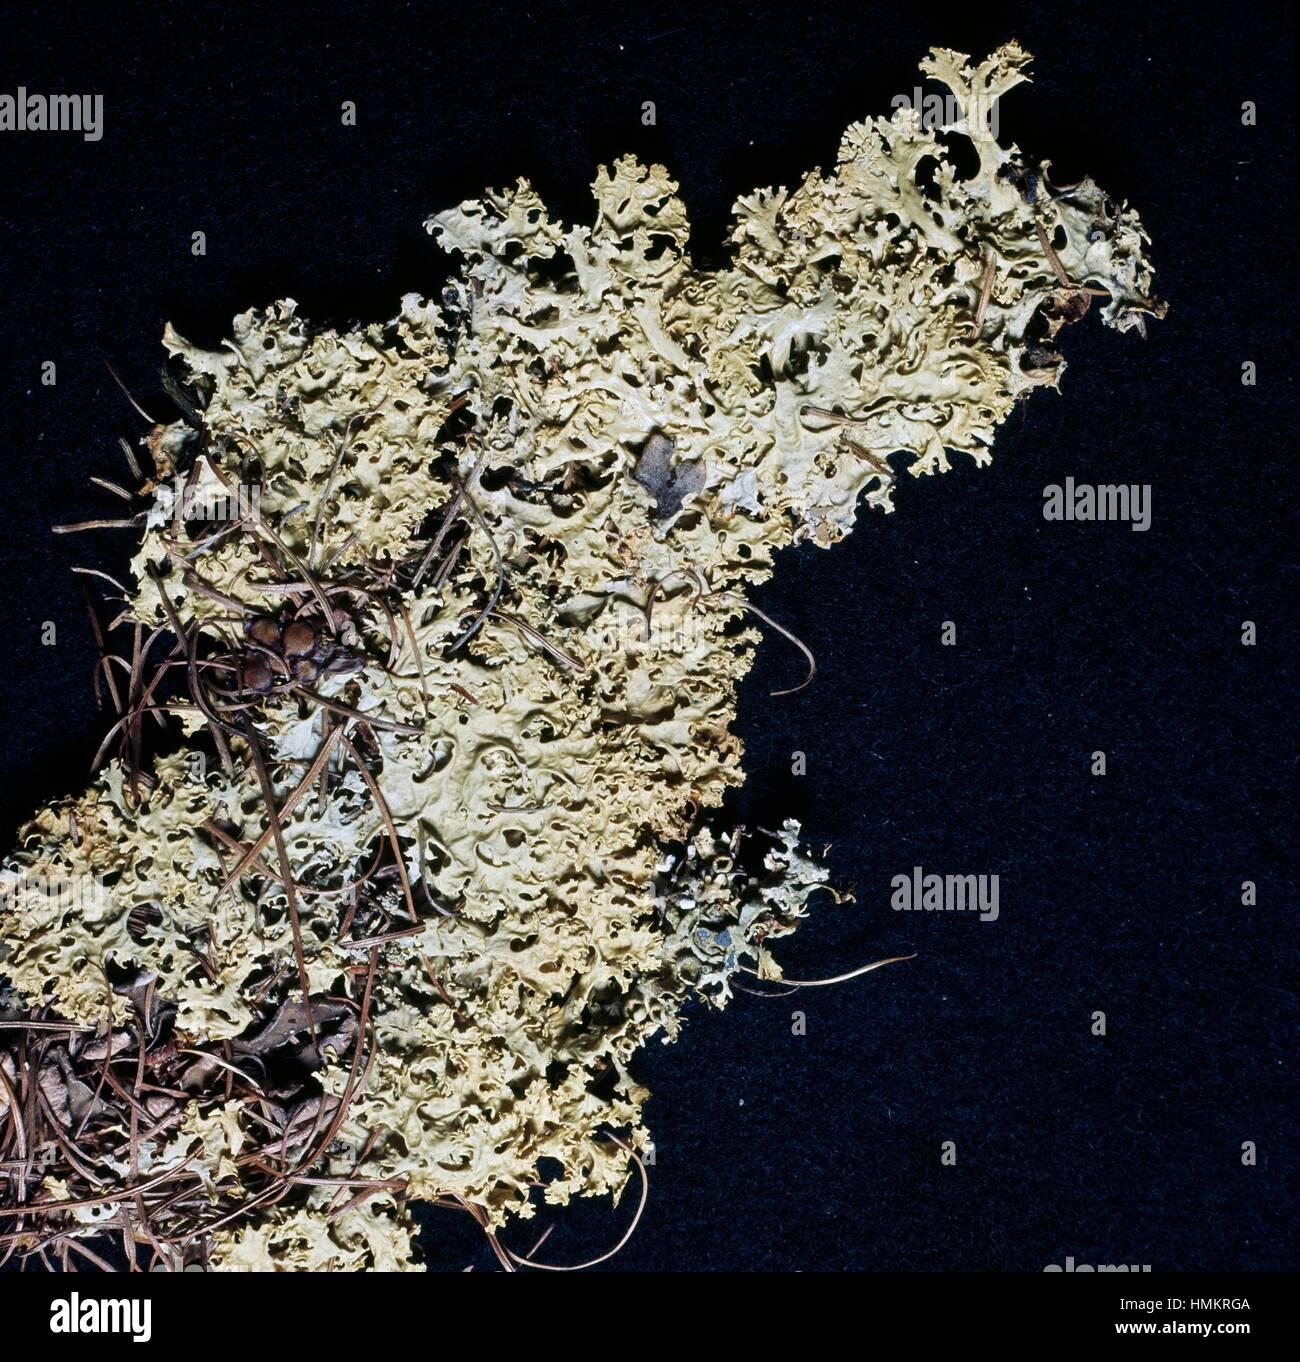 Ballroom Dervish (Flavocetraria nivalis), Parmeliaceae. - Stock Image